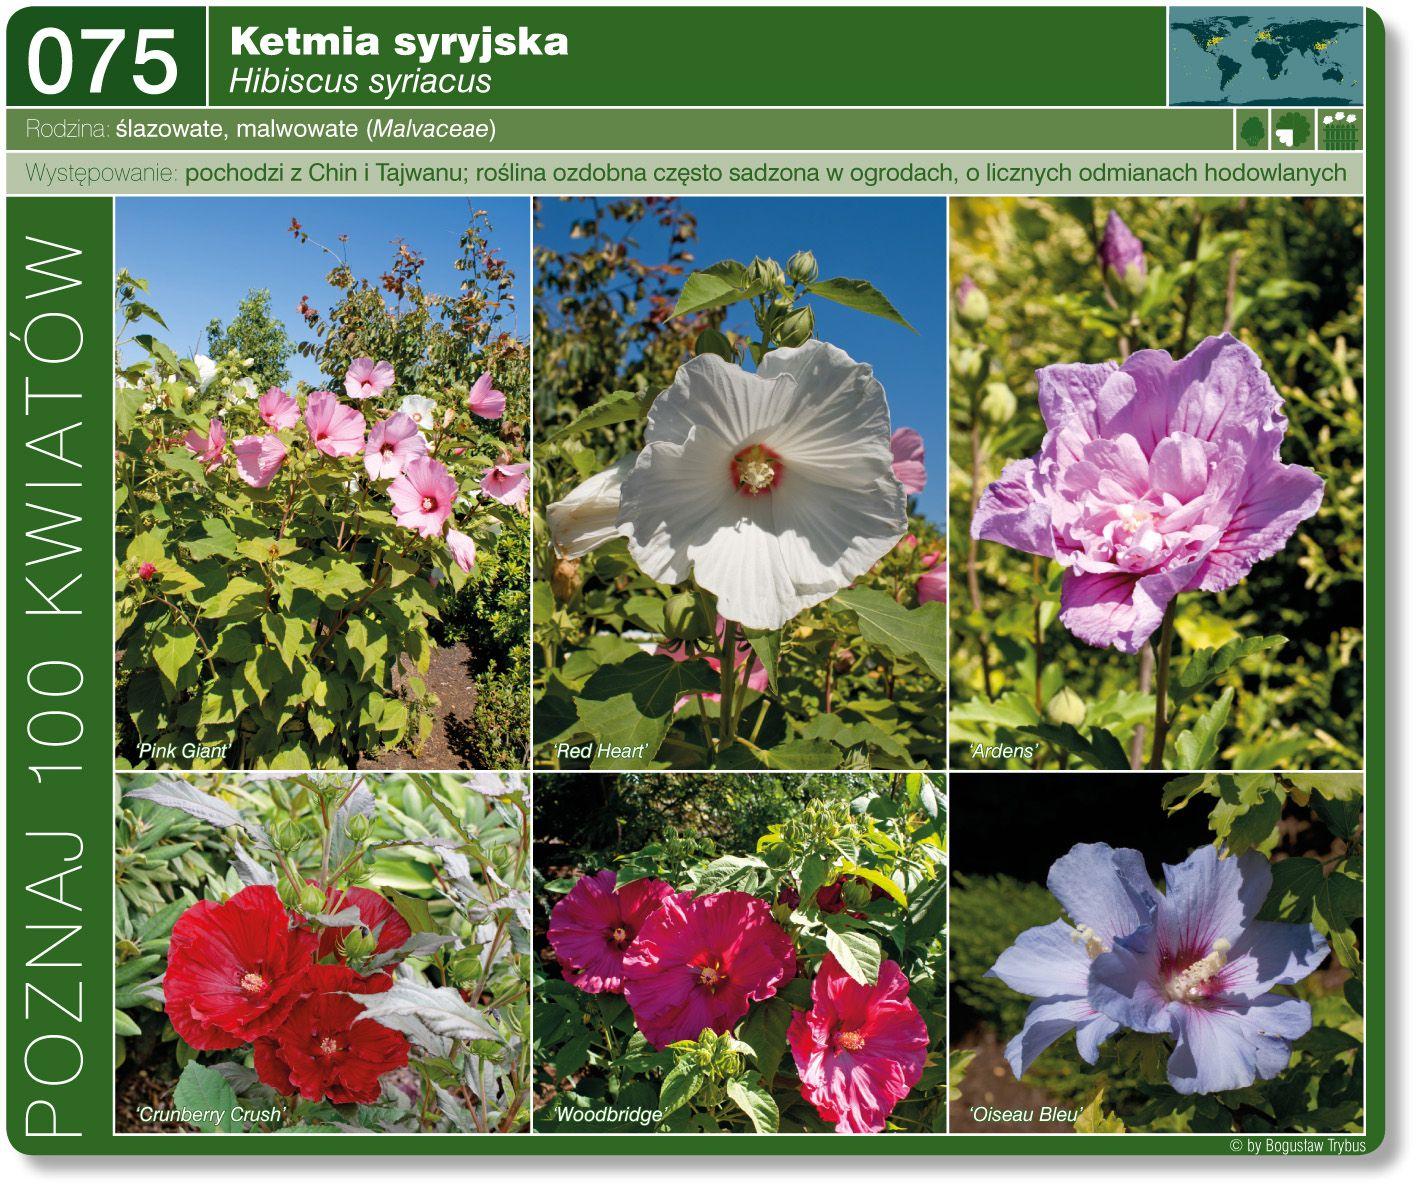 Ketmia Syryjska Plants